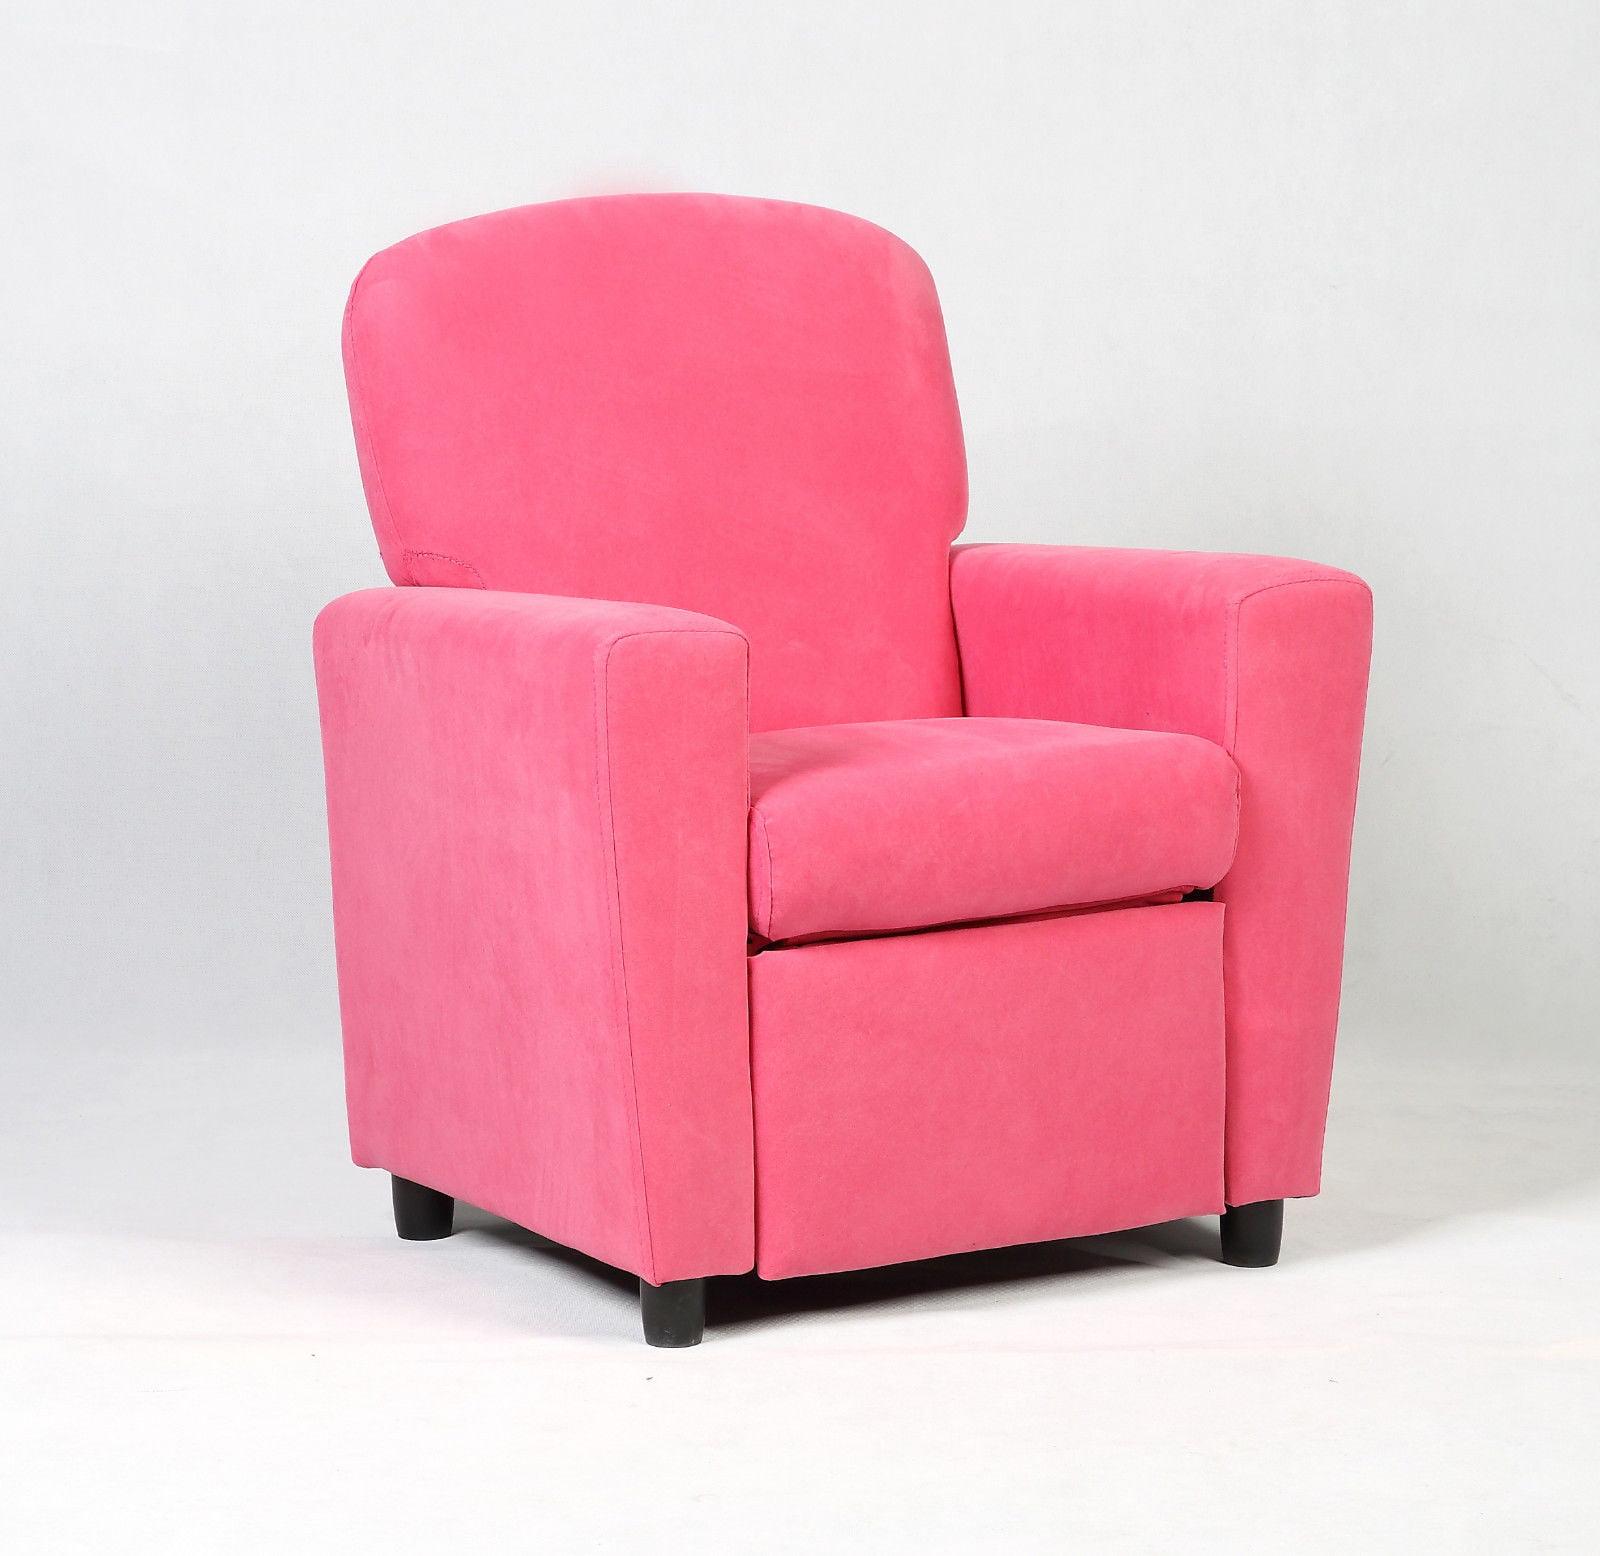 Costway Kids Recliner Sofa Armrest Chair Couch Lounge Children Pink